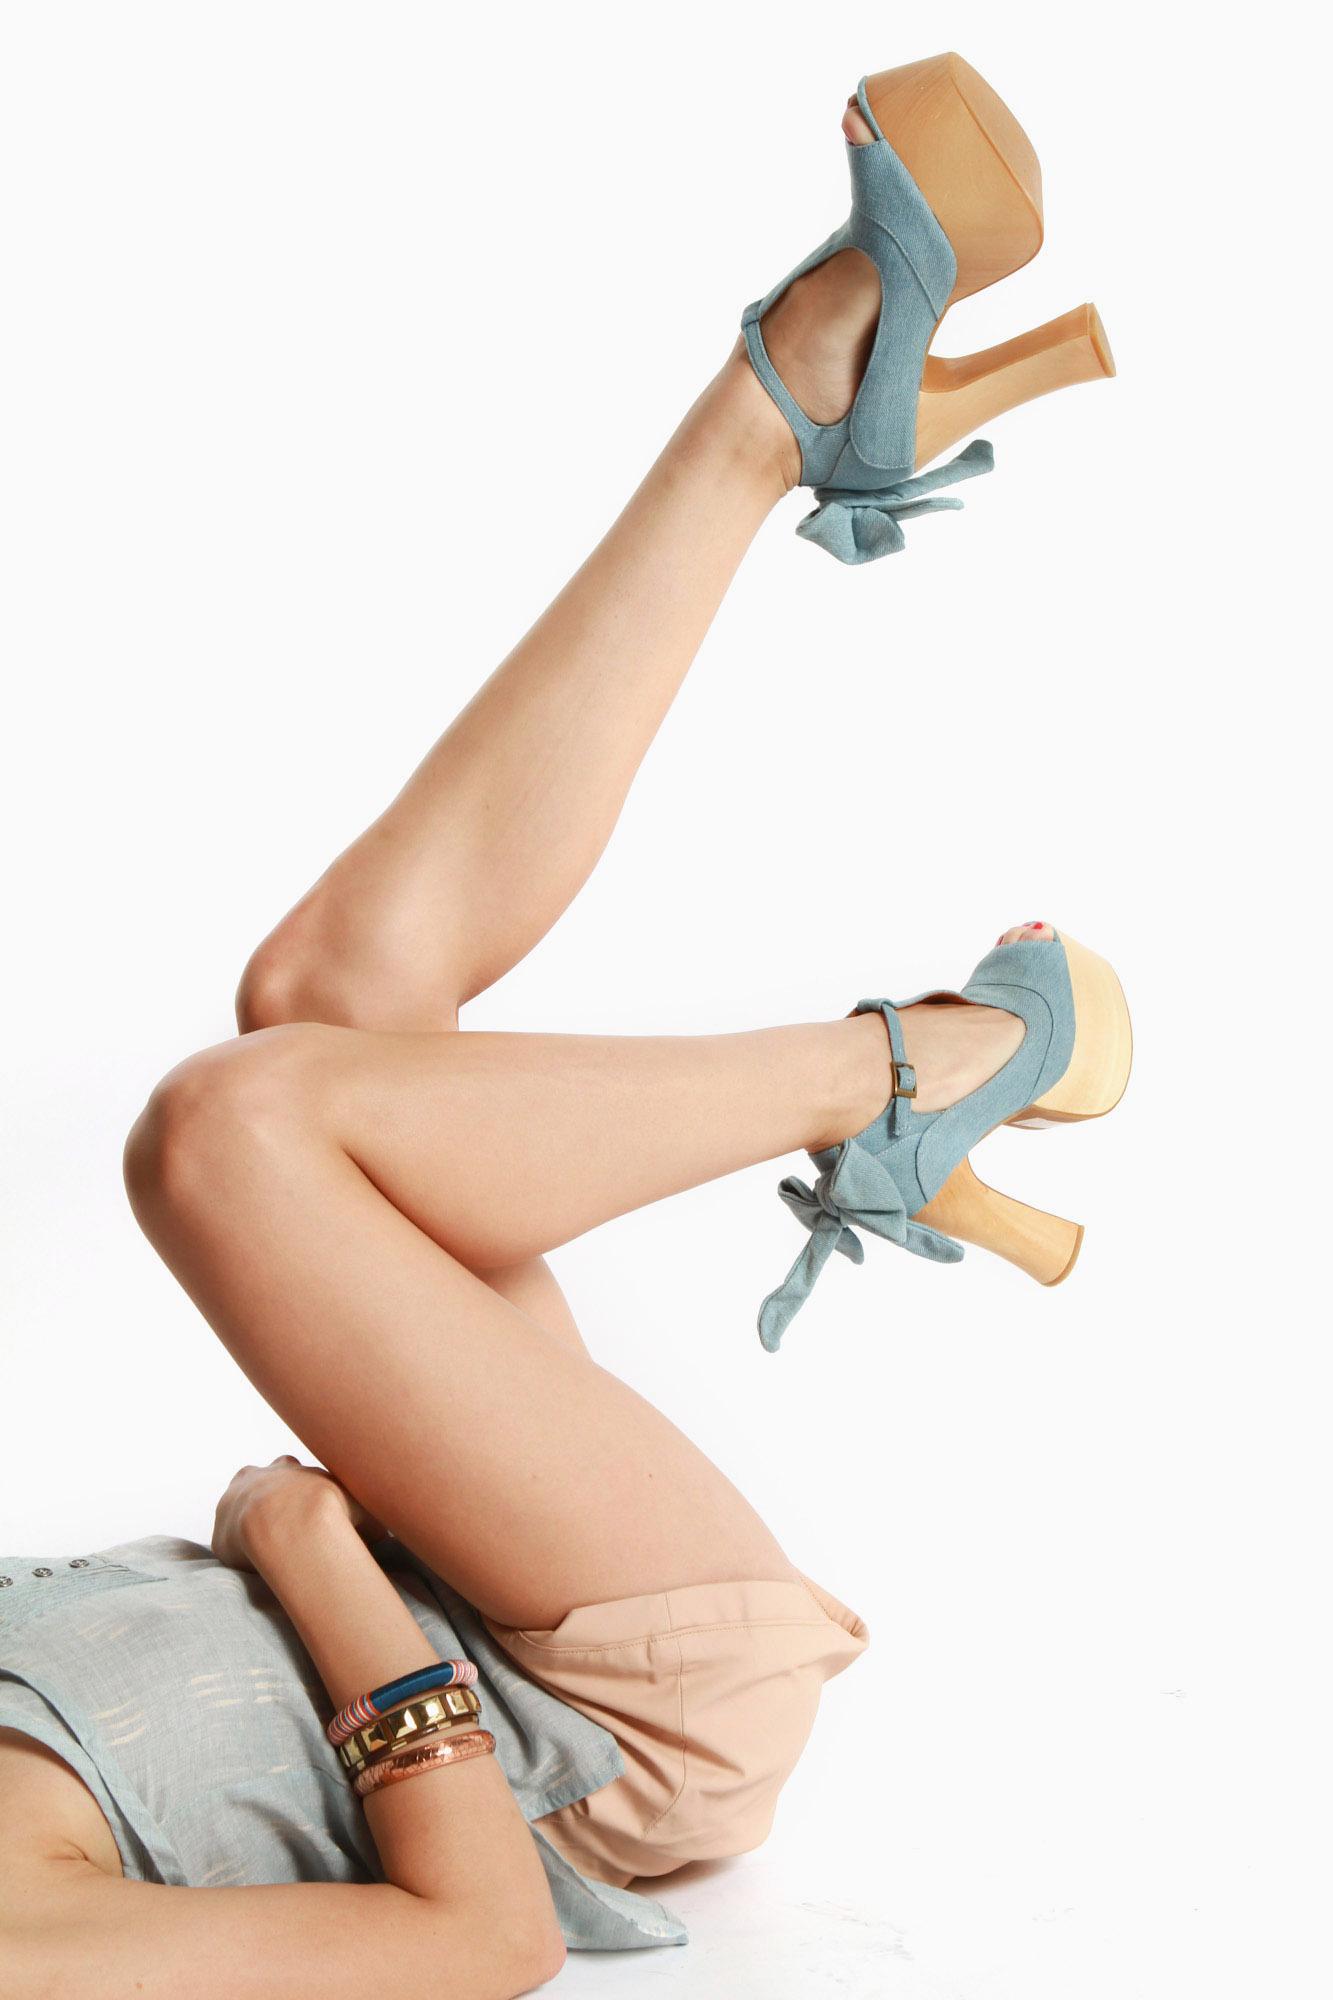 Jeffrey Campbell x Wildfox Shoe Release